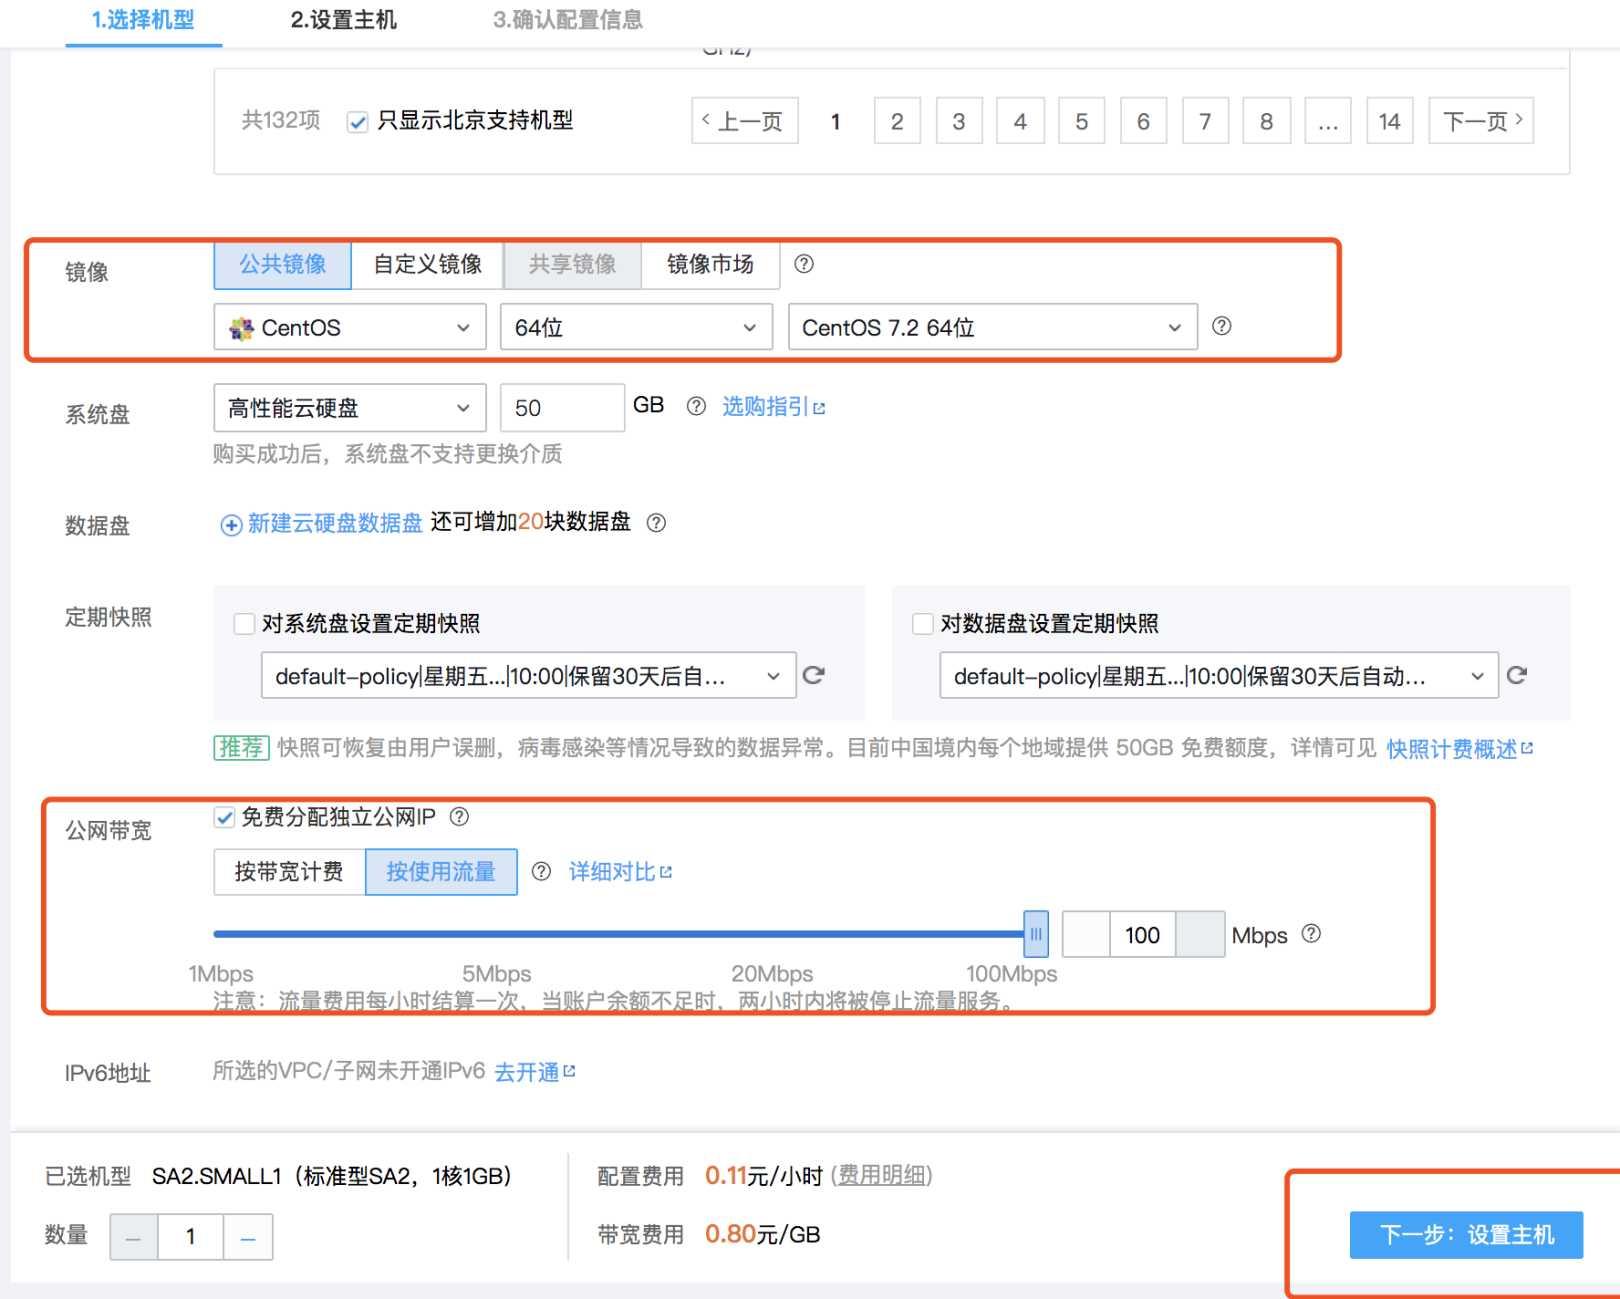 WordPress安装教程之基于LNMP环境安装WordPress网站